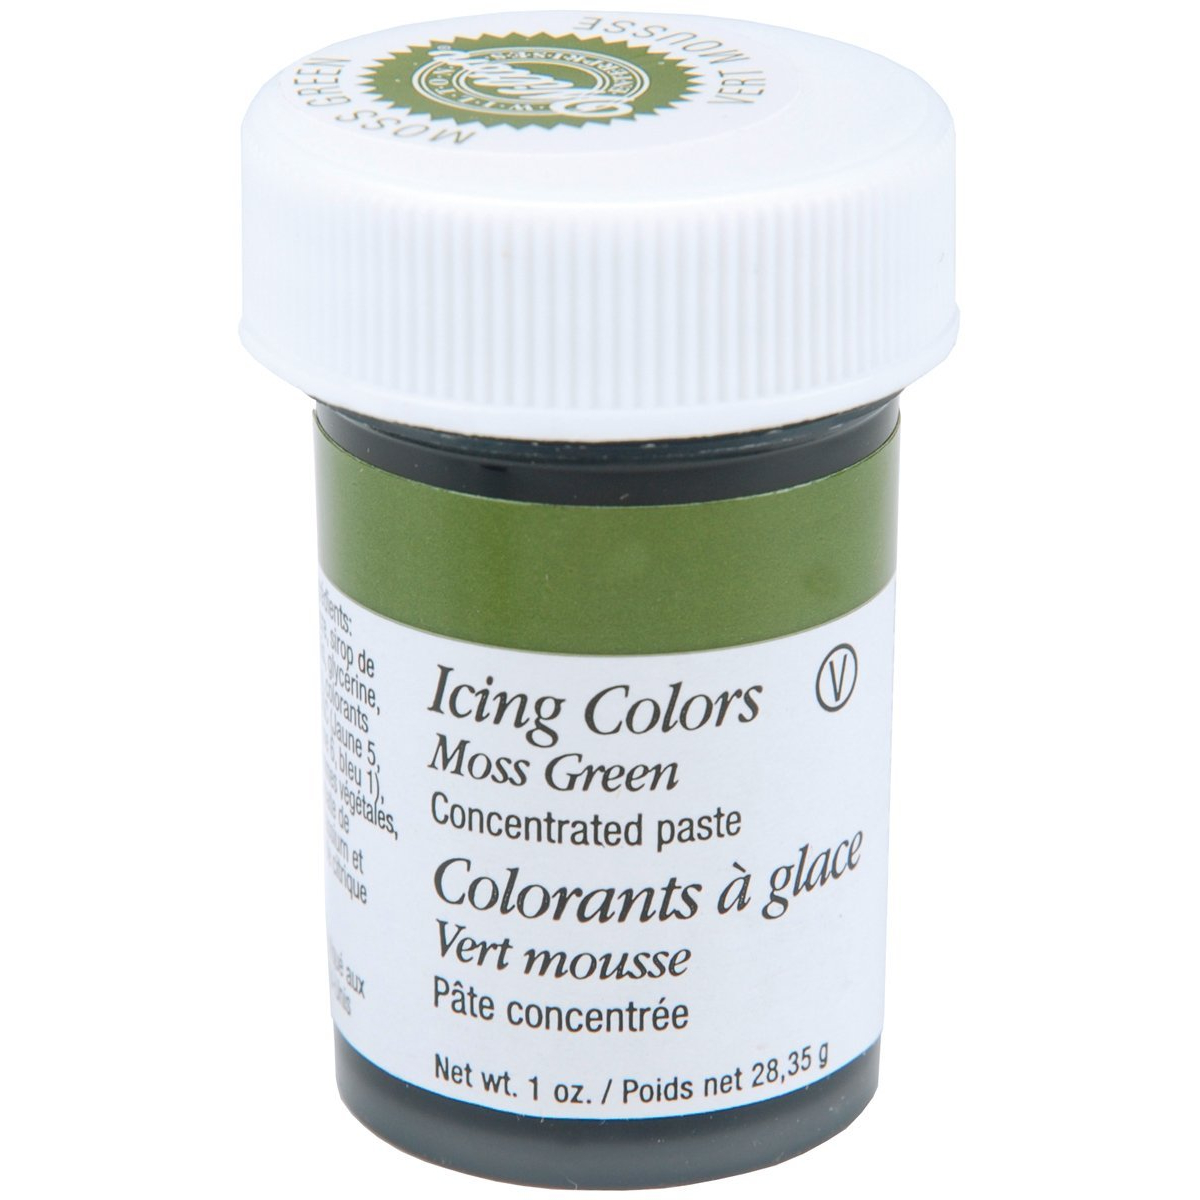 Cake Decorating Gel Paste : Wilton Food Colour Icing Color Concentrate Gel Dye Paste ...